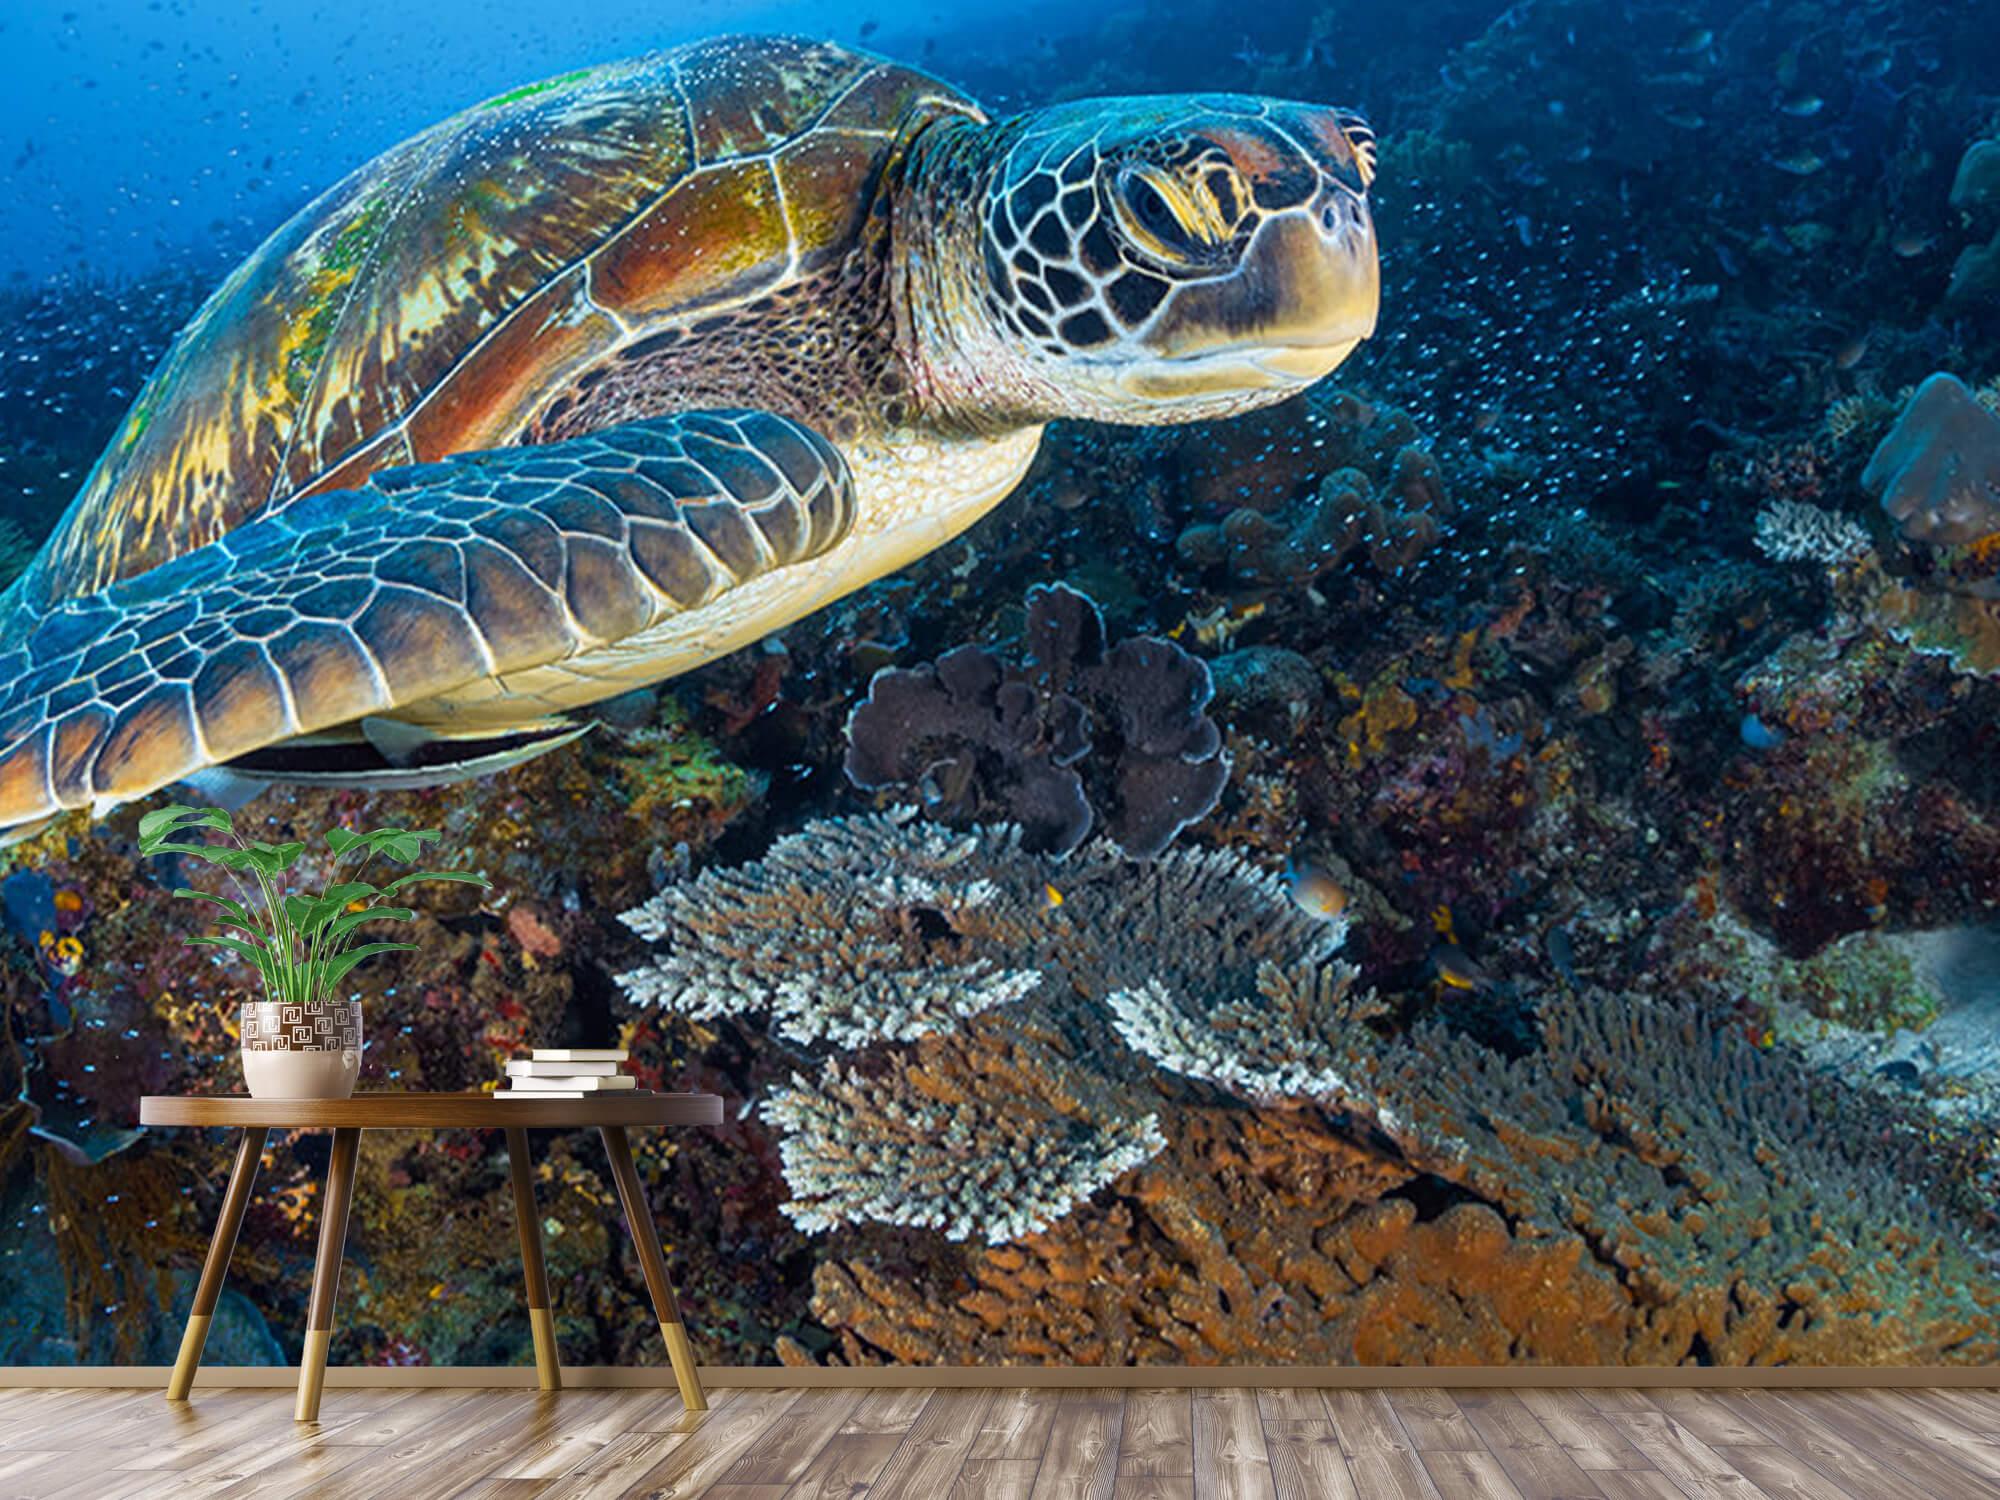 Green sea turtle from Raja Ampat 6